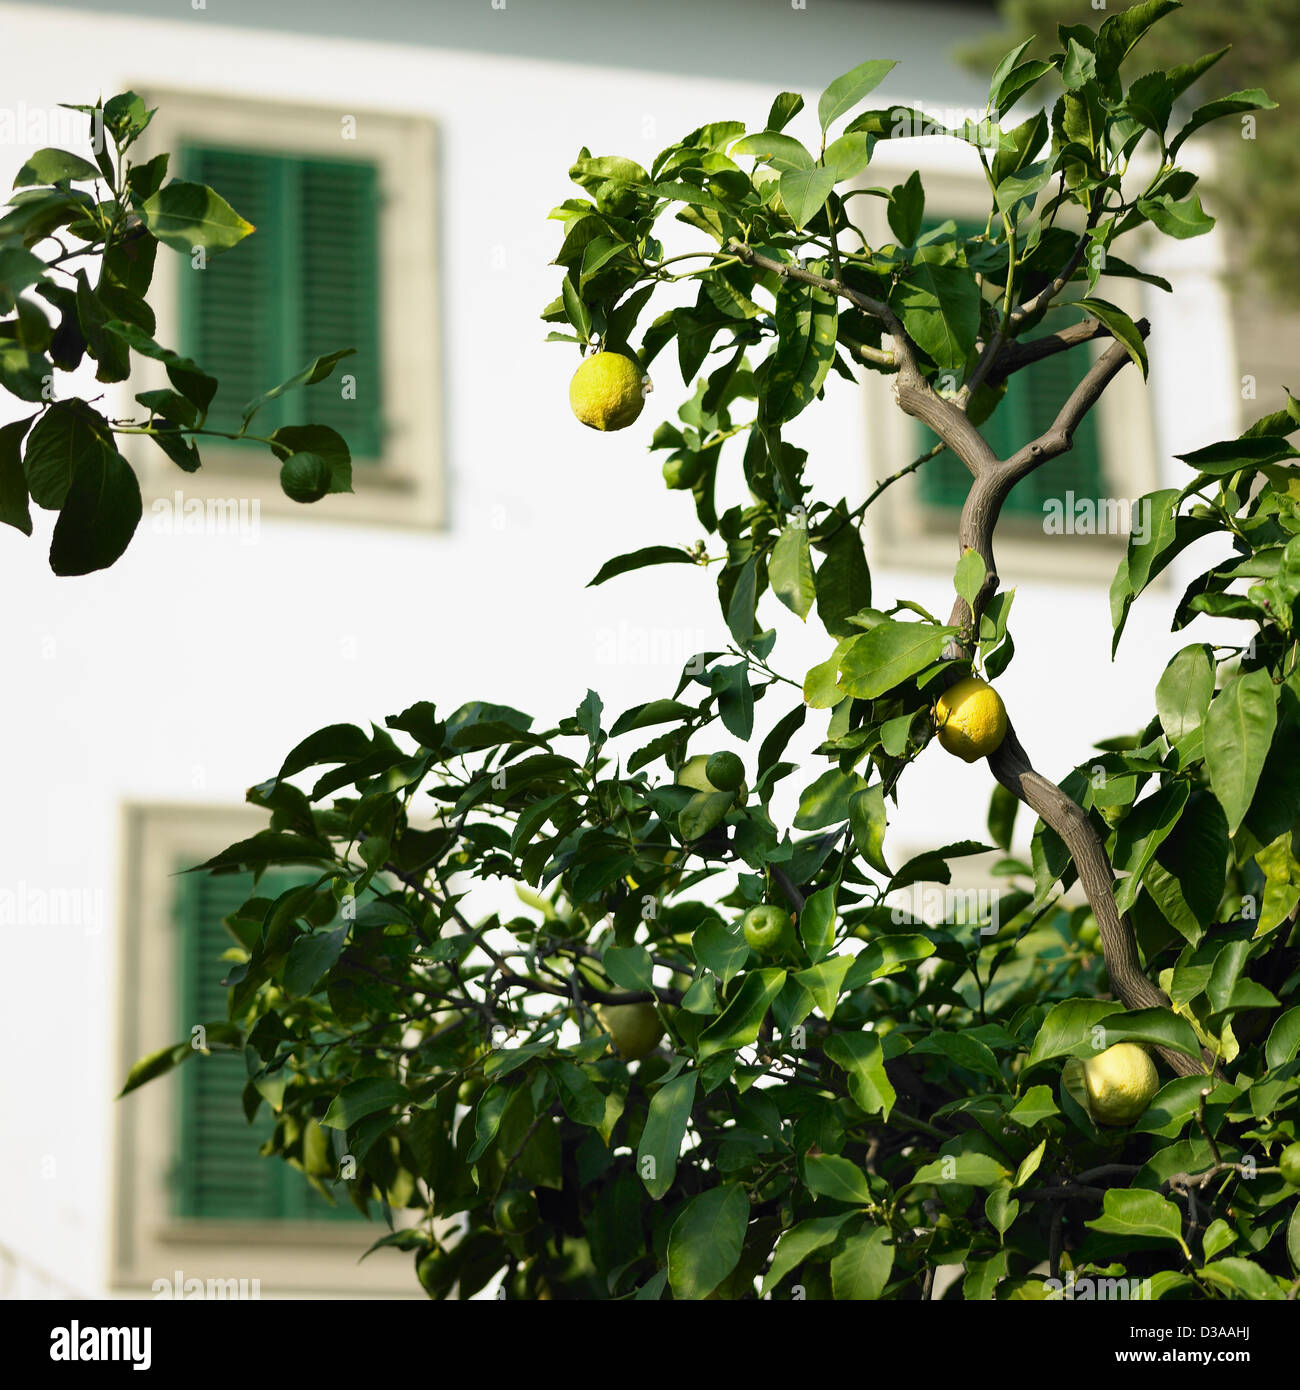 Fruit tree outdoors - Stock Image